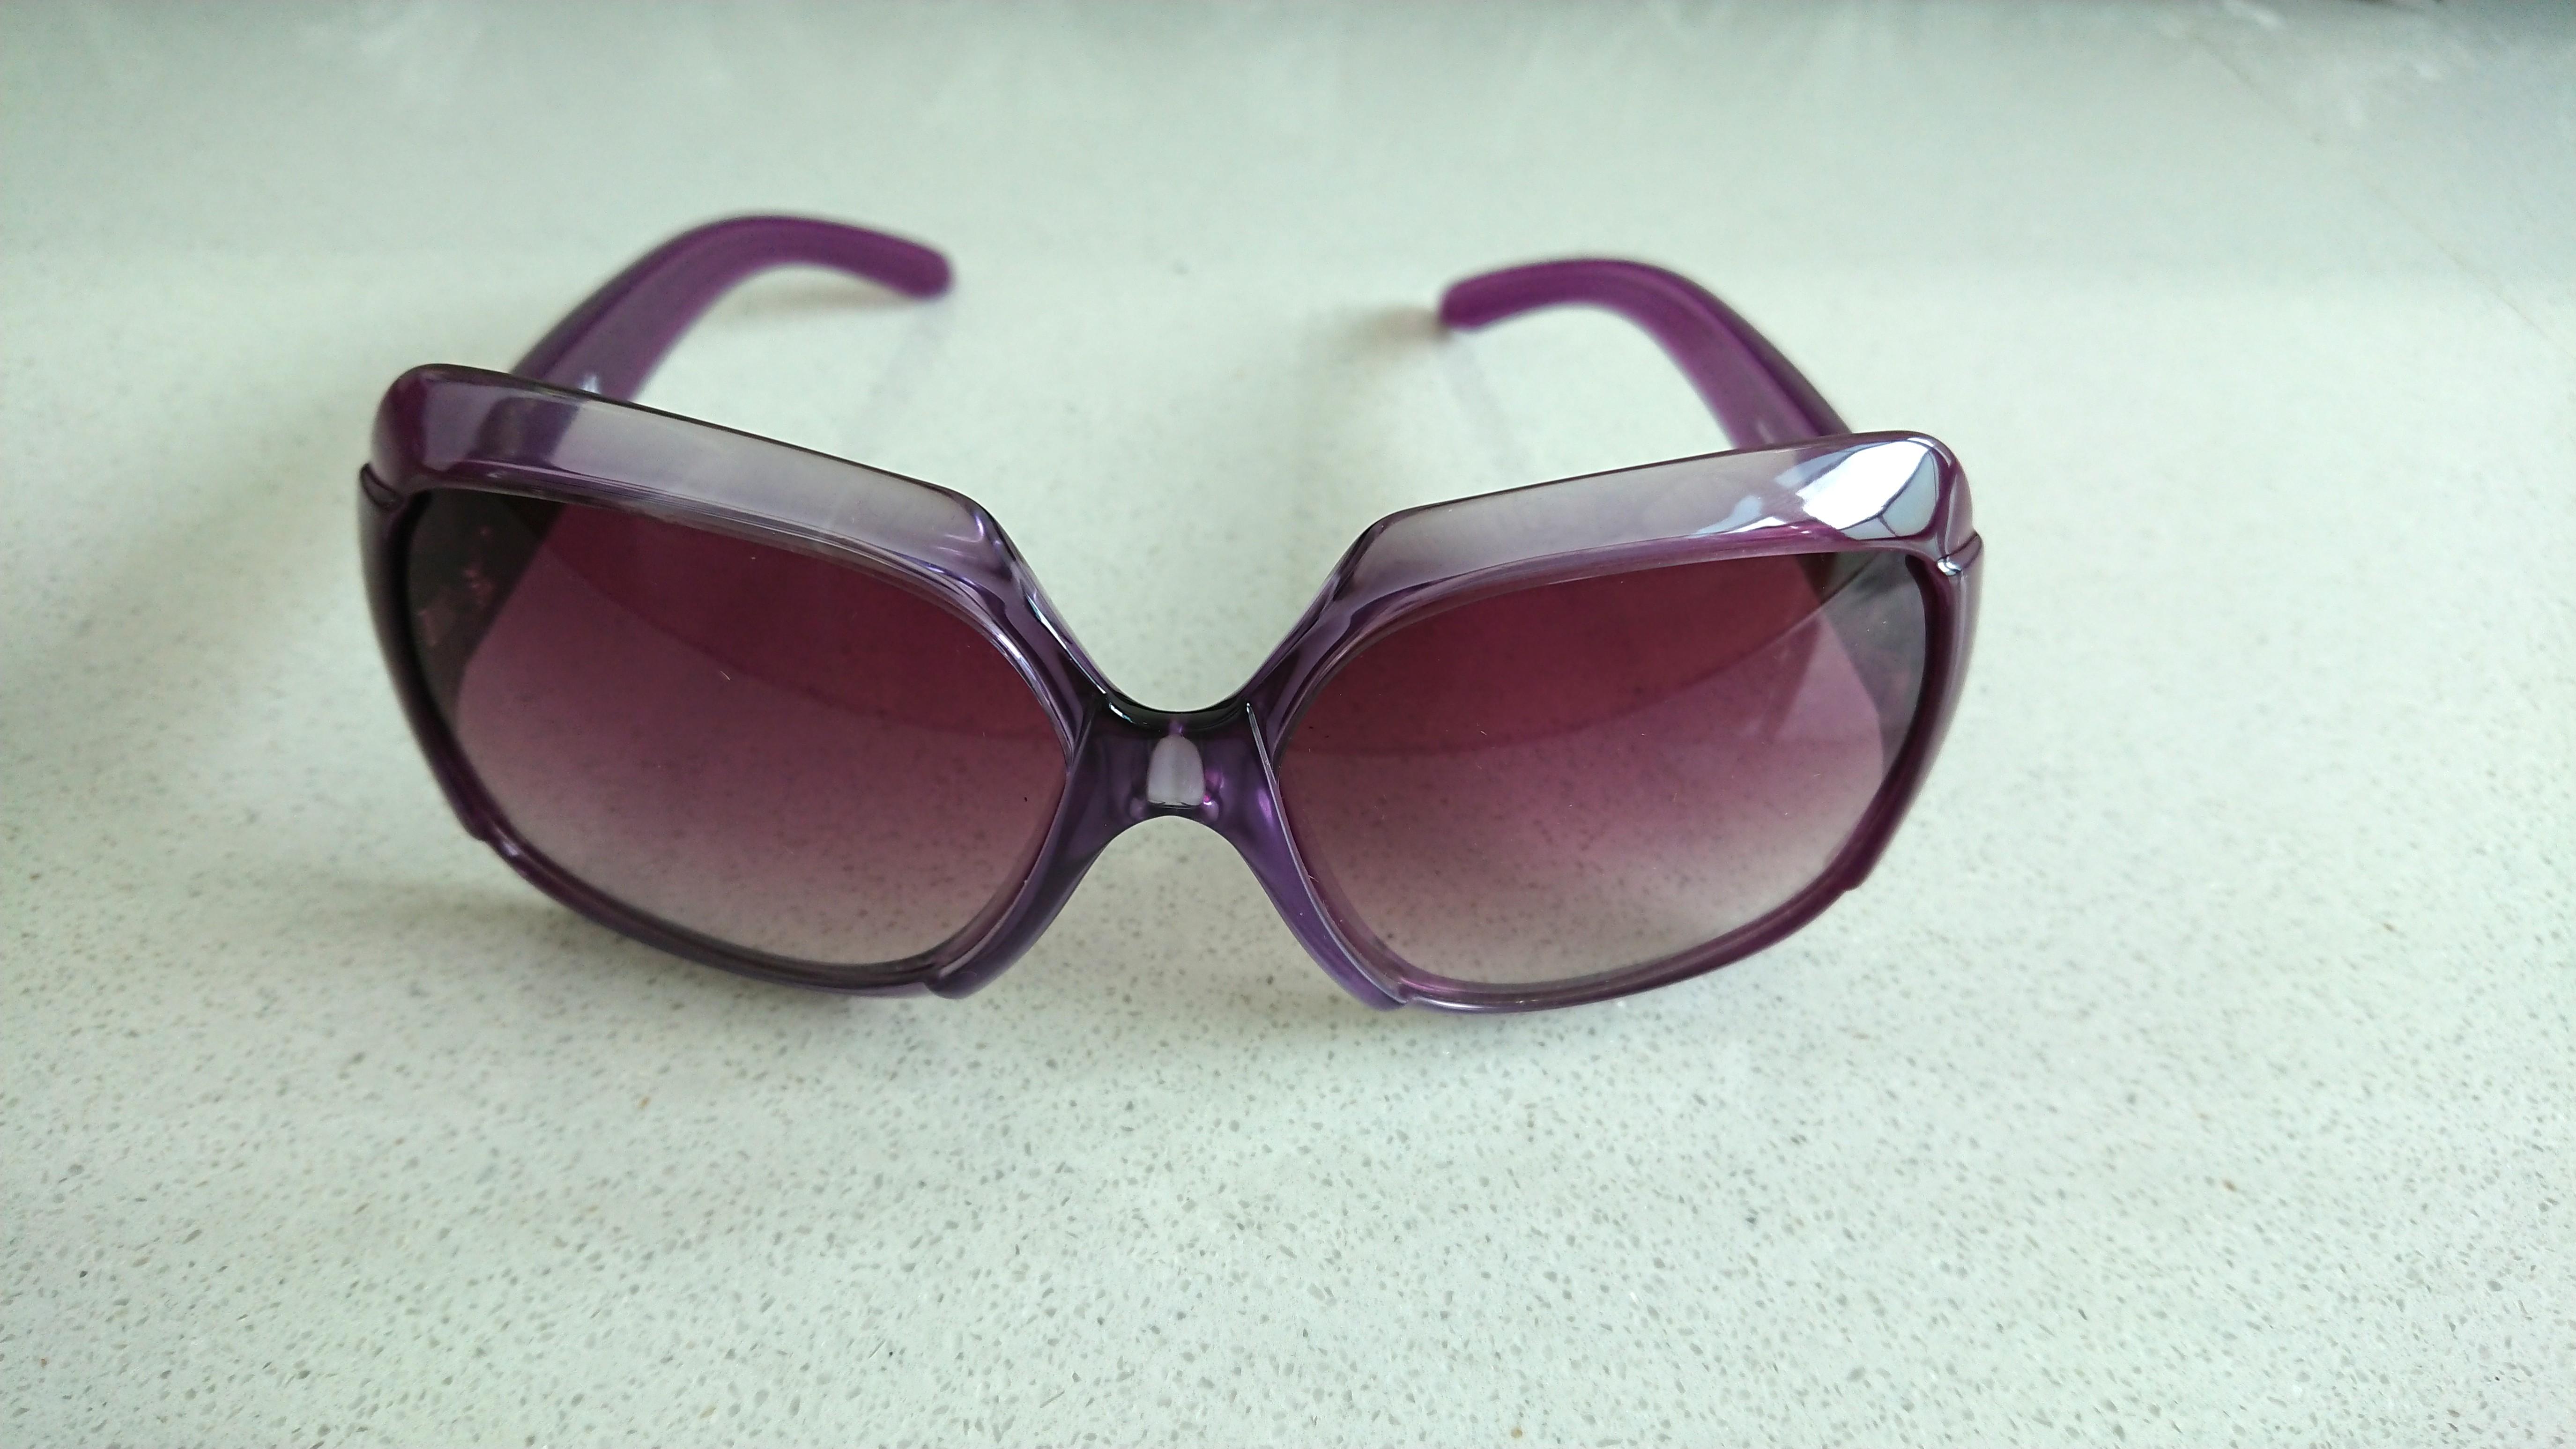 e0f01cc9bebe Miu Miu Sunglasses - Purple frame   purple gradient